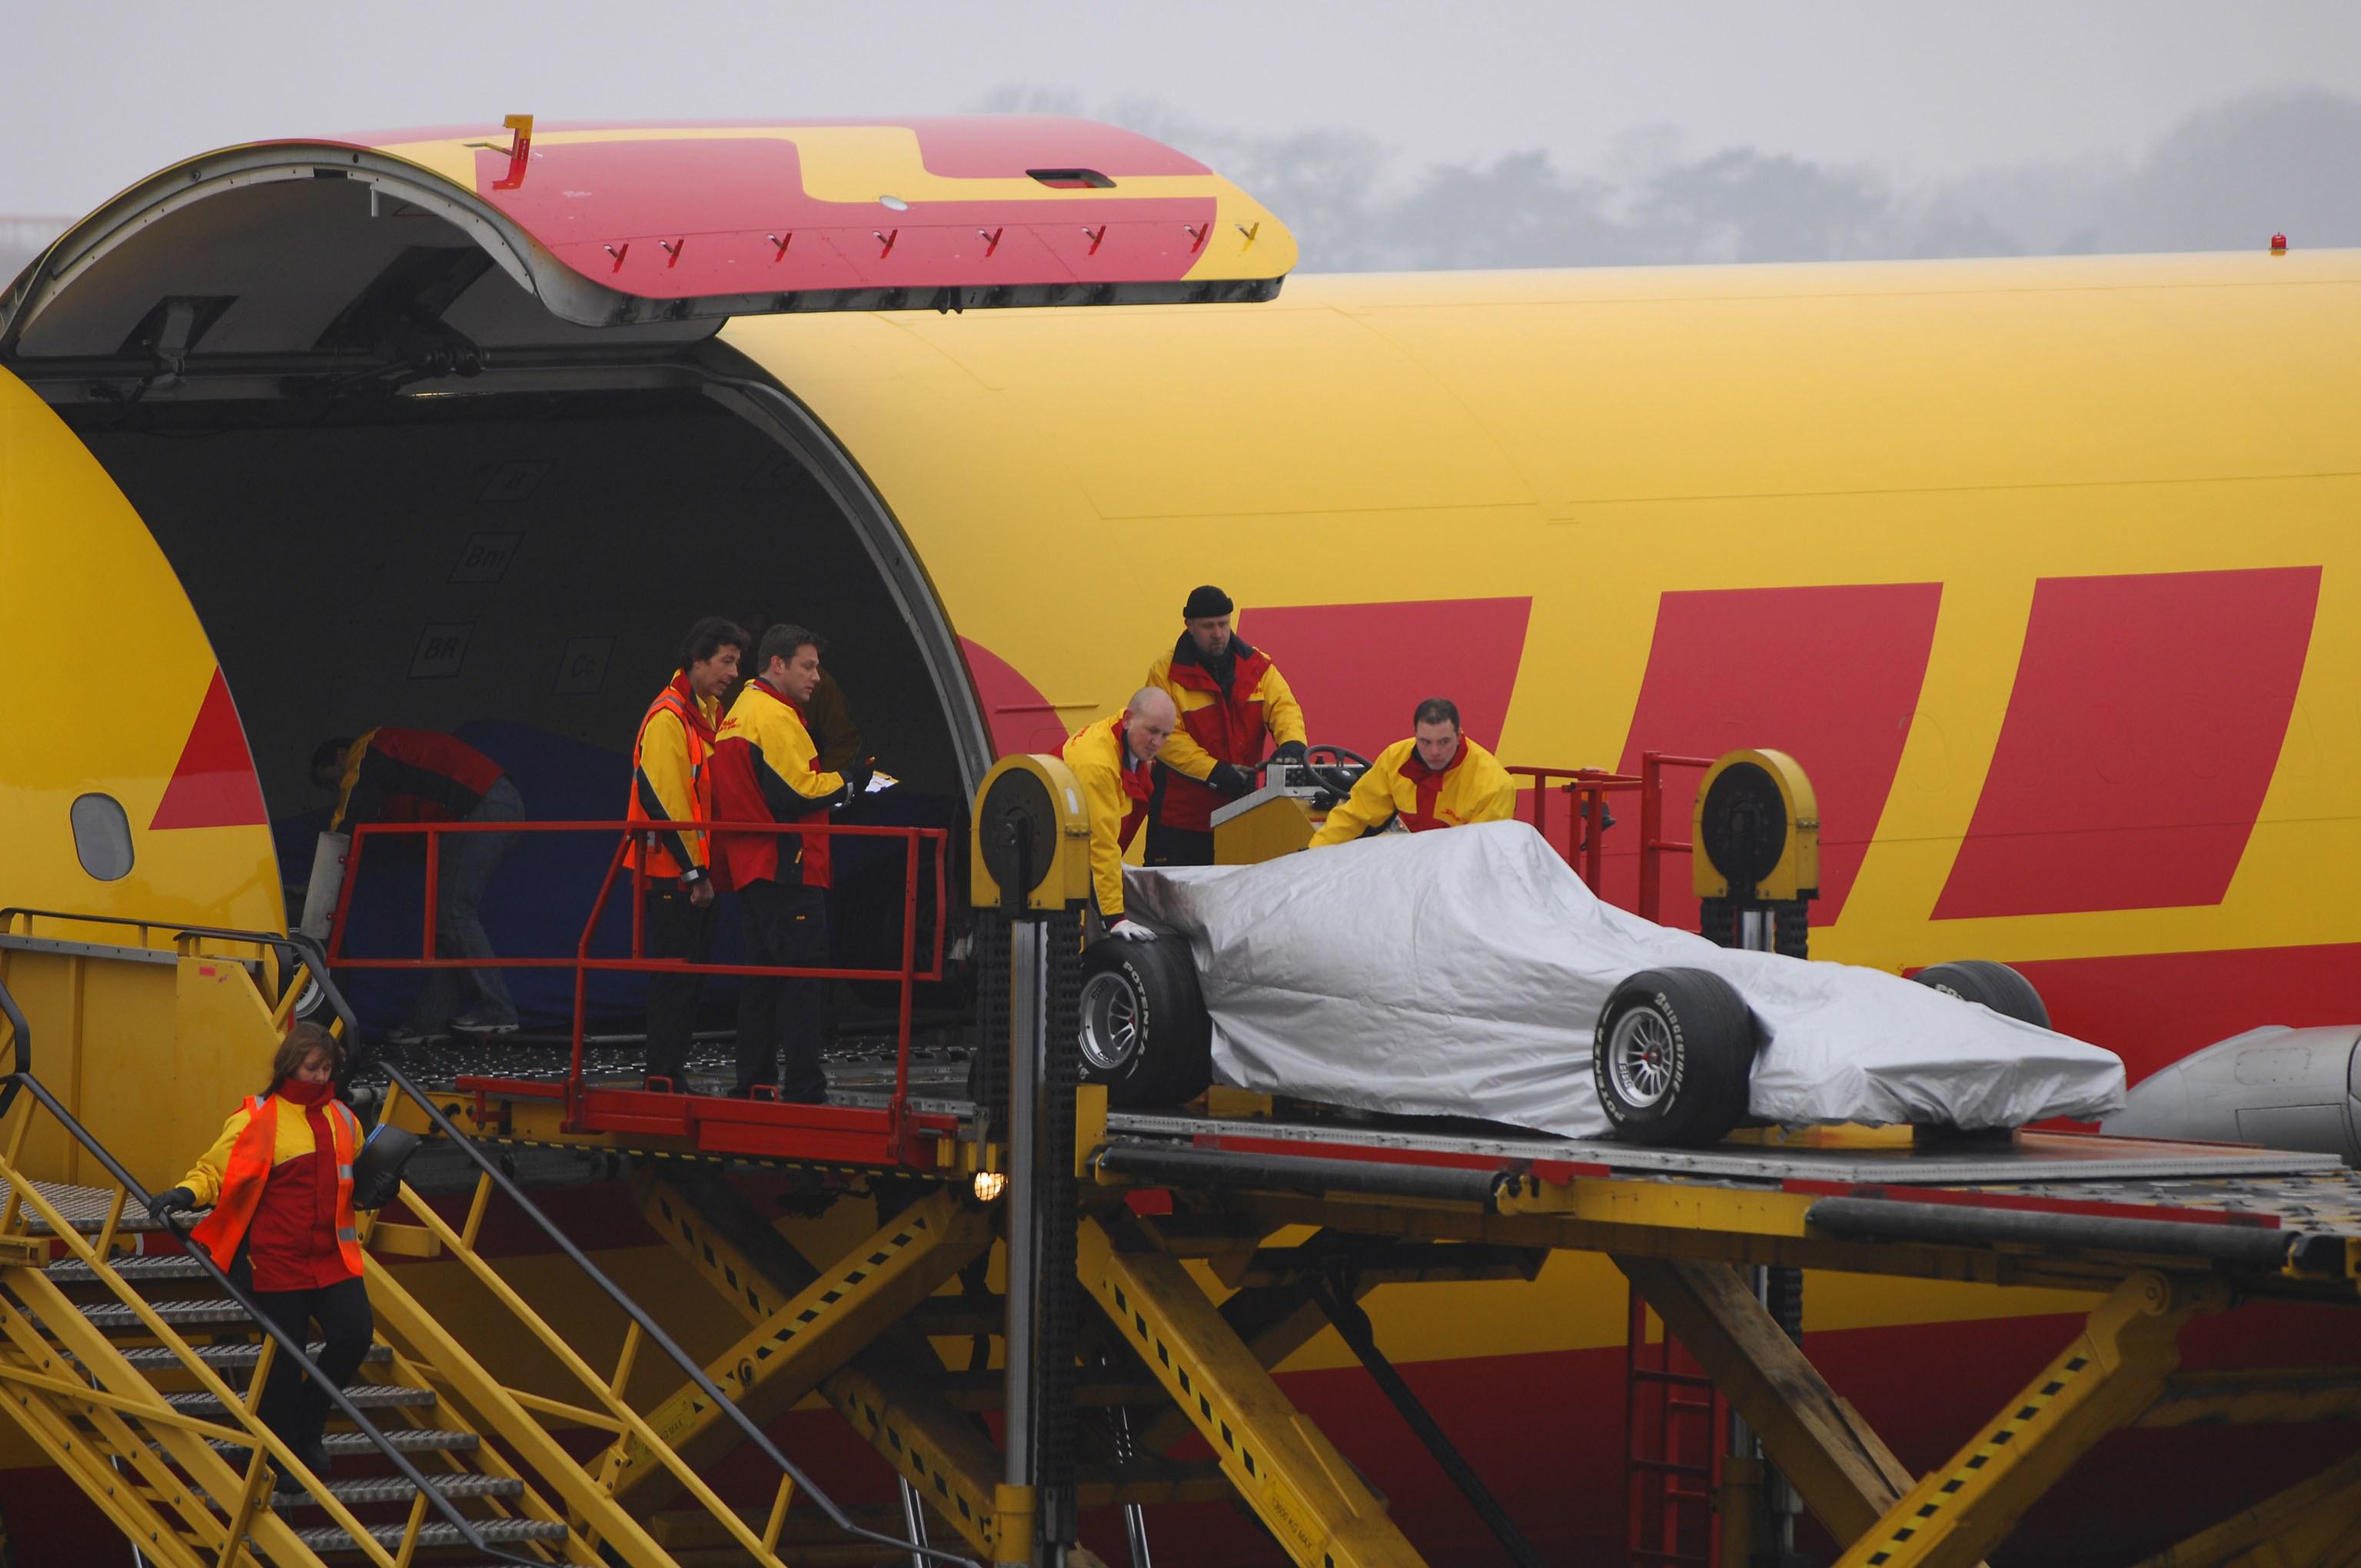 DHL国际快递 DHL可选服务 DHL快递可选服务 DHL国际快递可选服务 DHL国际快递费用 DHL快递 国际快递 鹿跃国际快递